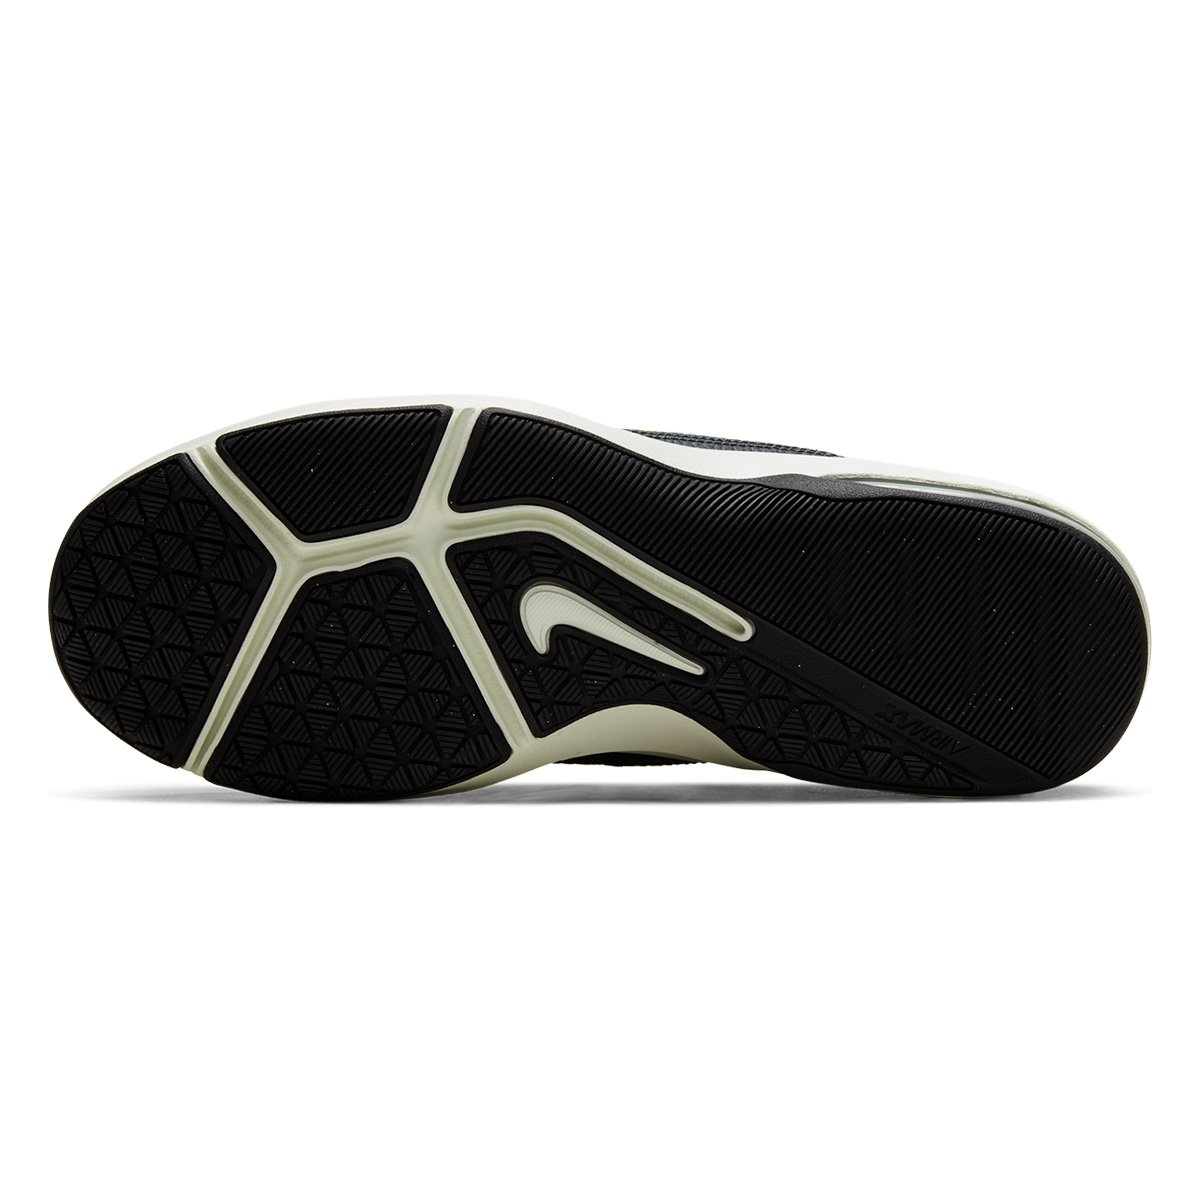 Tênis Nike Air Max Alpha Trainer 2 Preto e Amarelo - Masculino